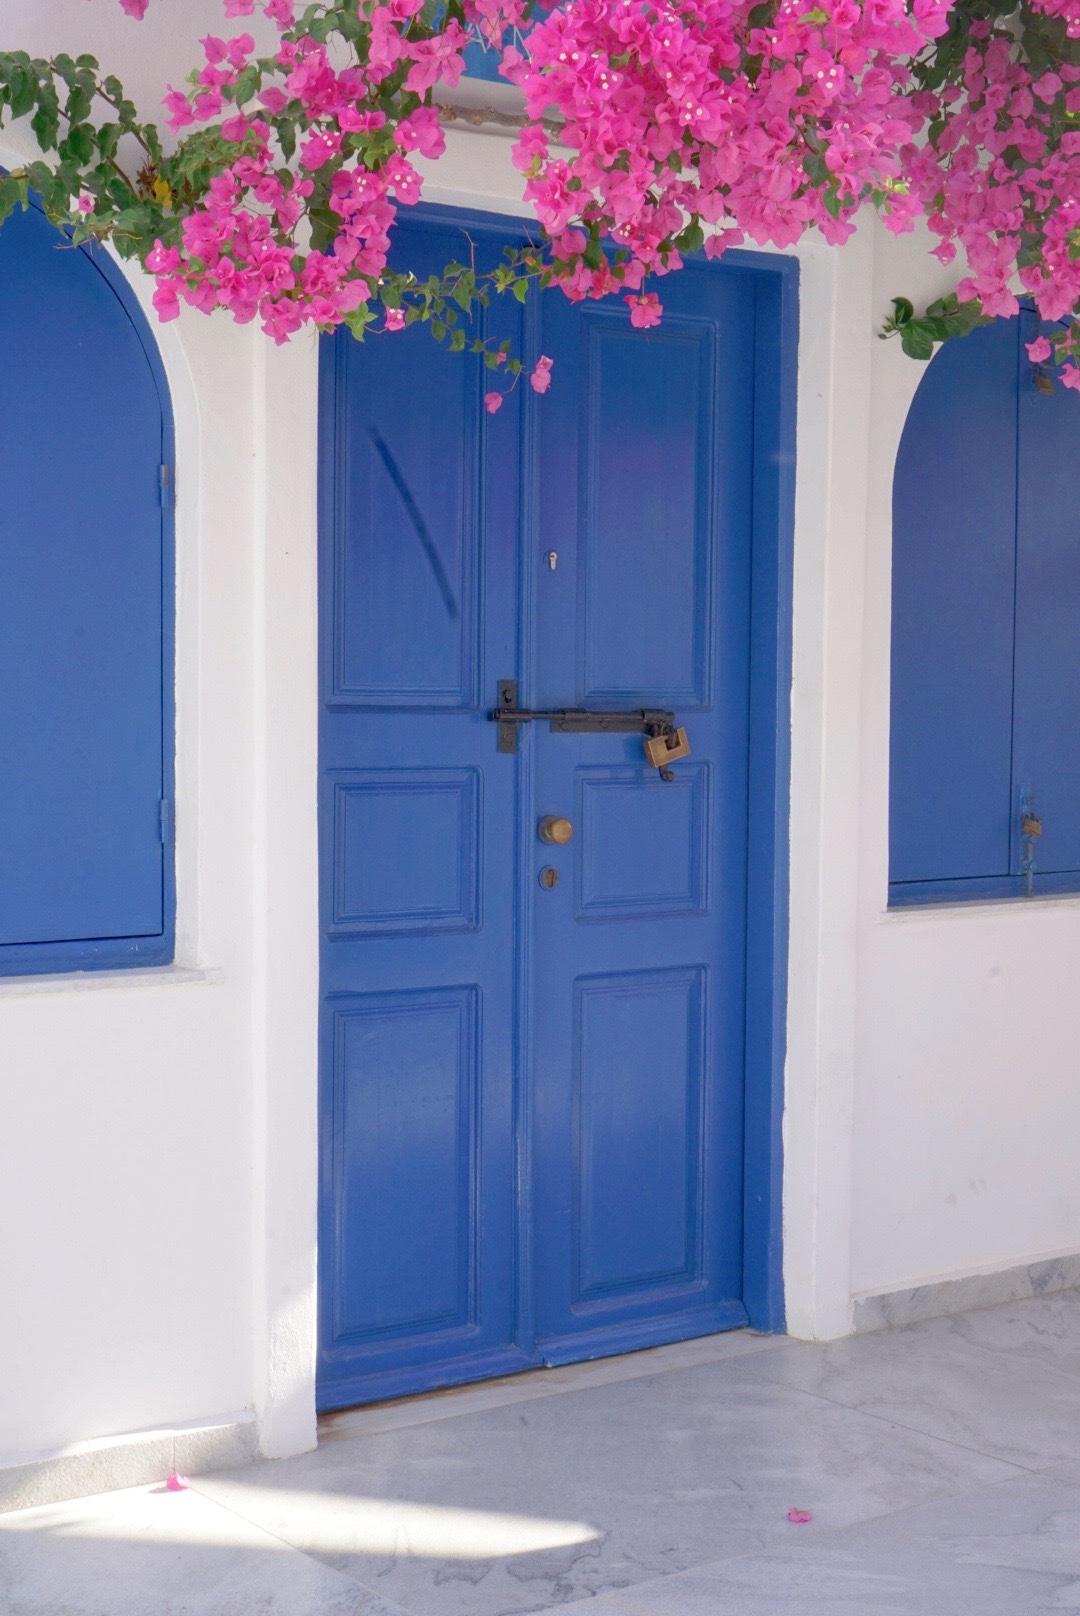 acs 0268 - A Few Days in Santorini